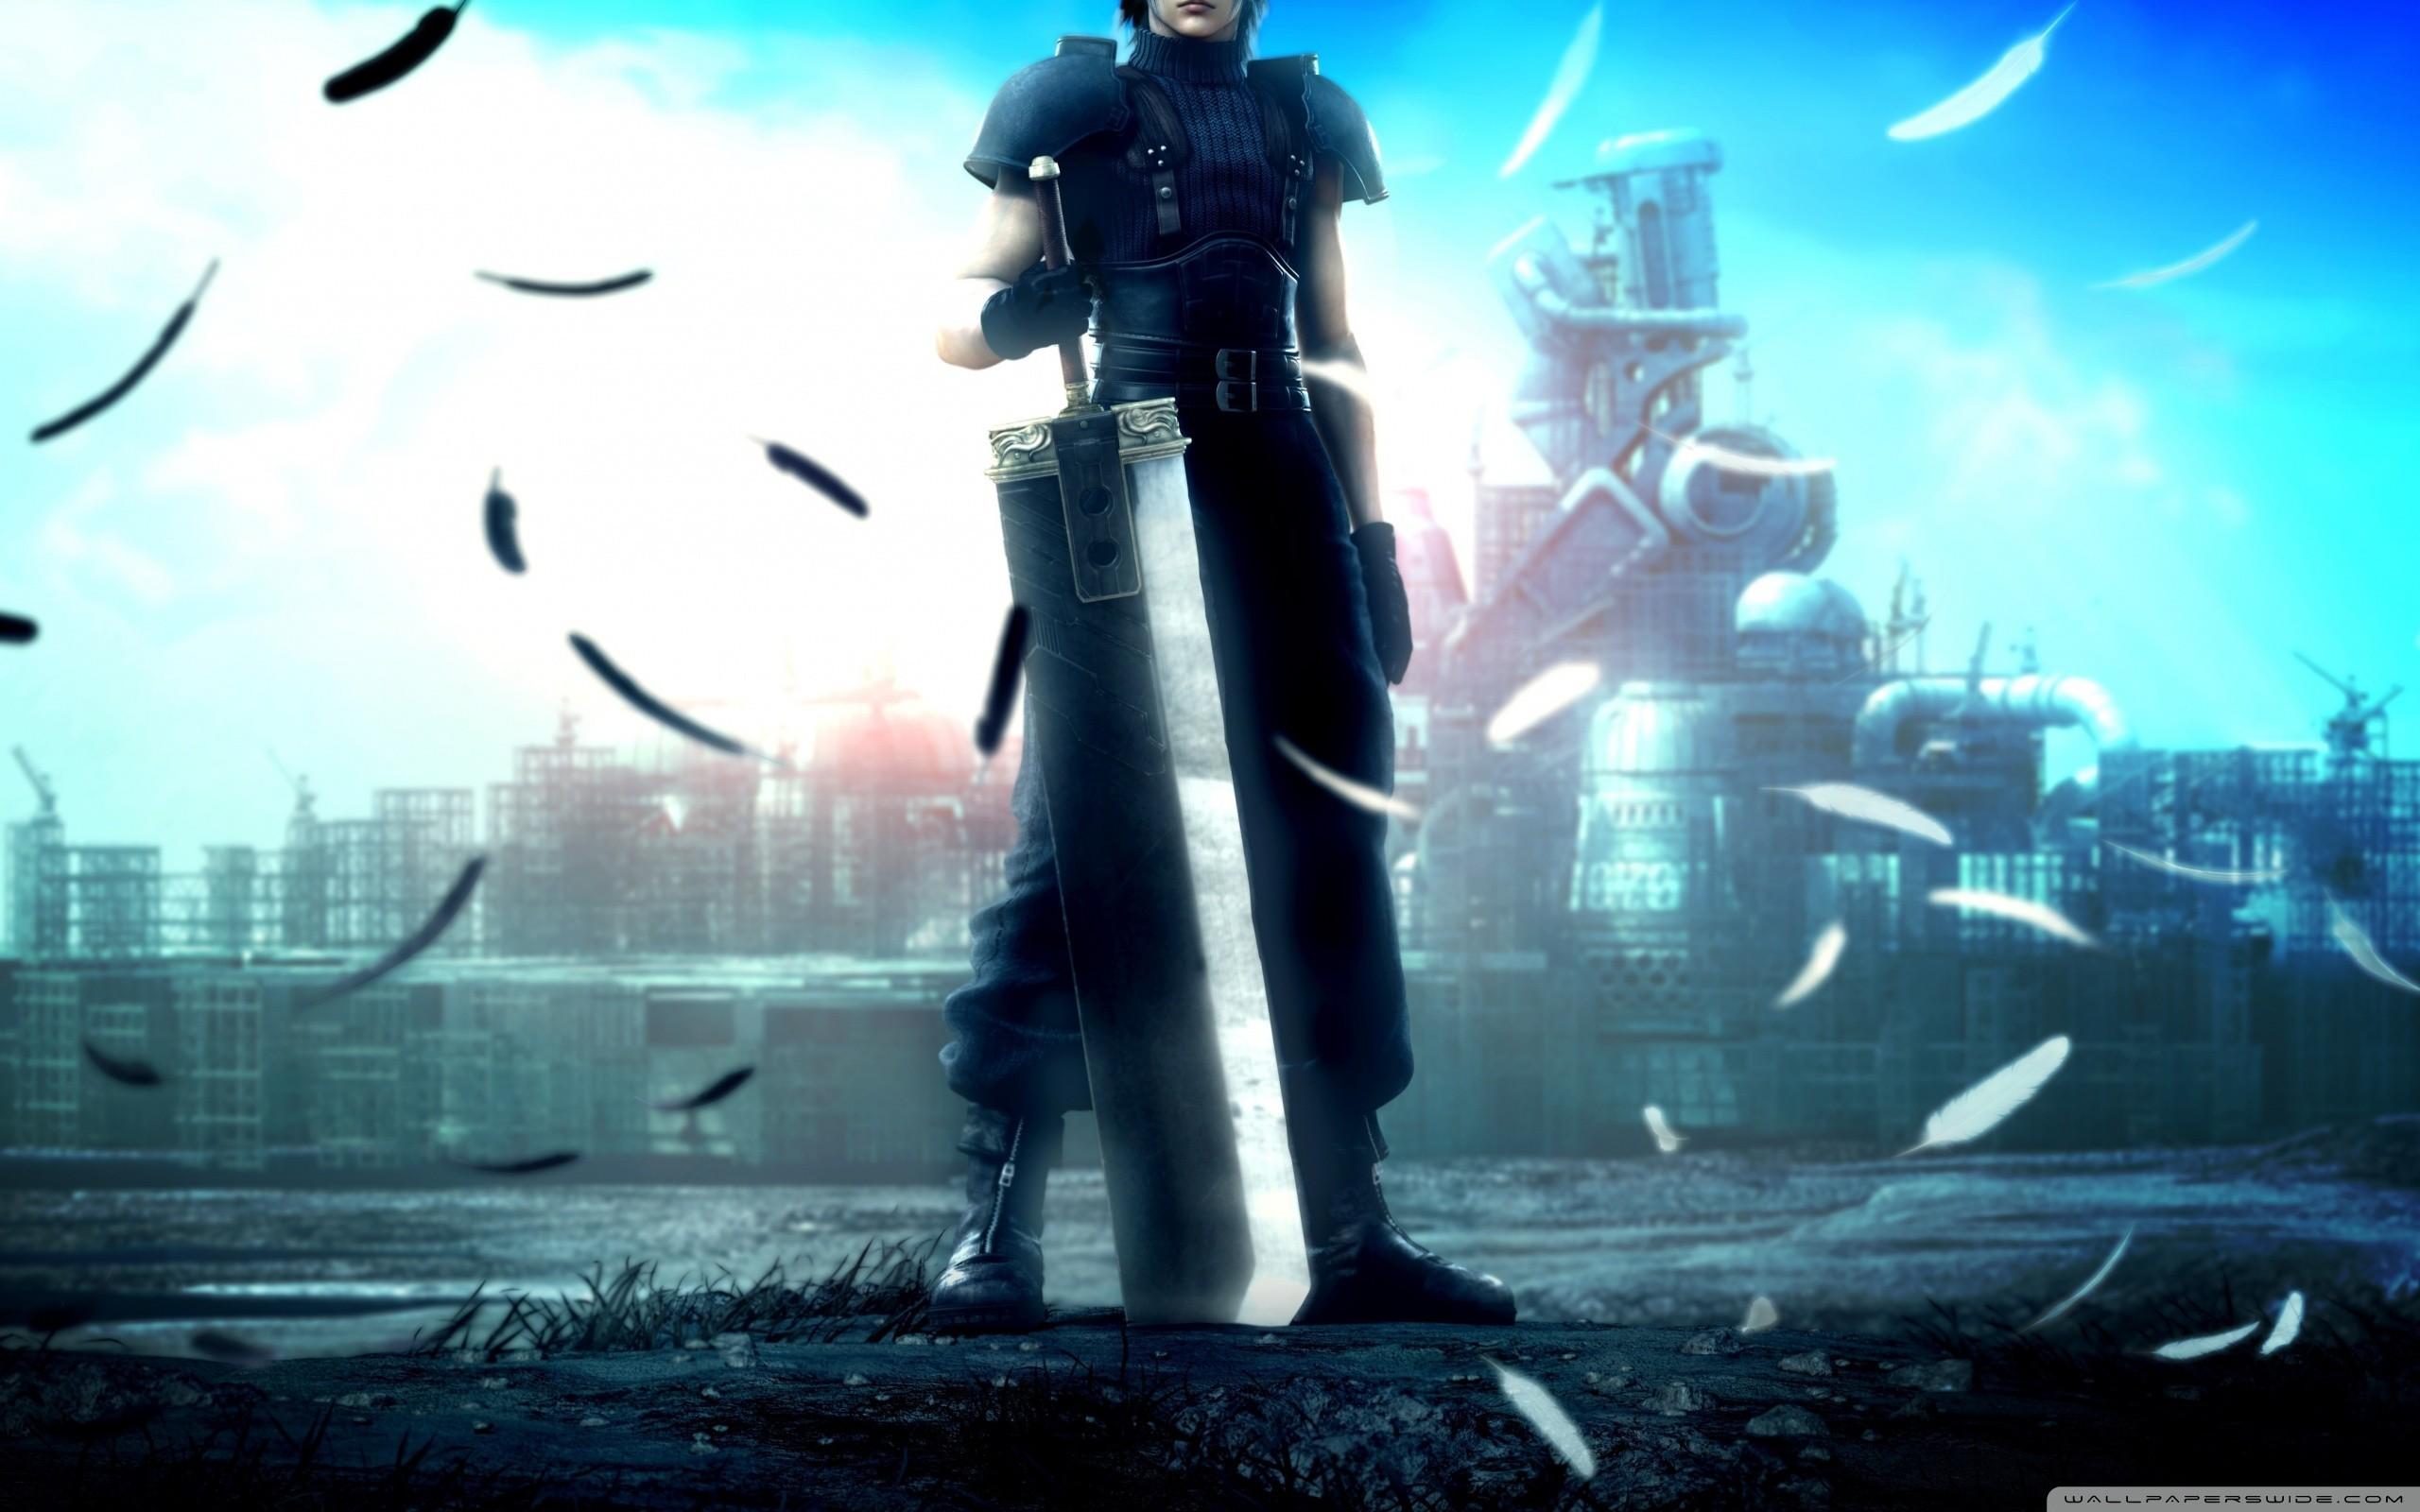 Final Fantasy 7 Sephiroth Wallpaper 70 Images